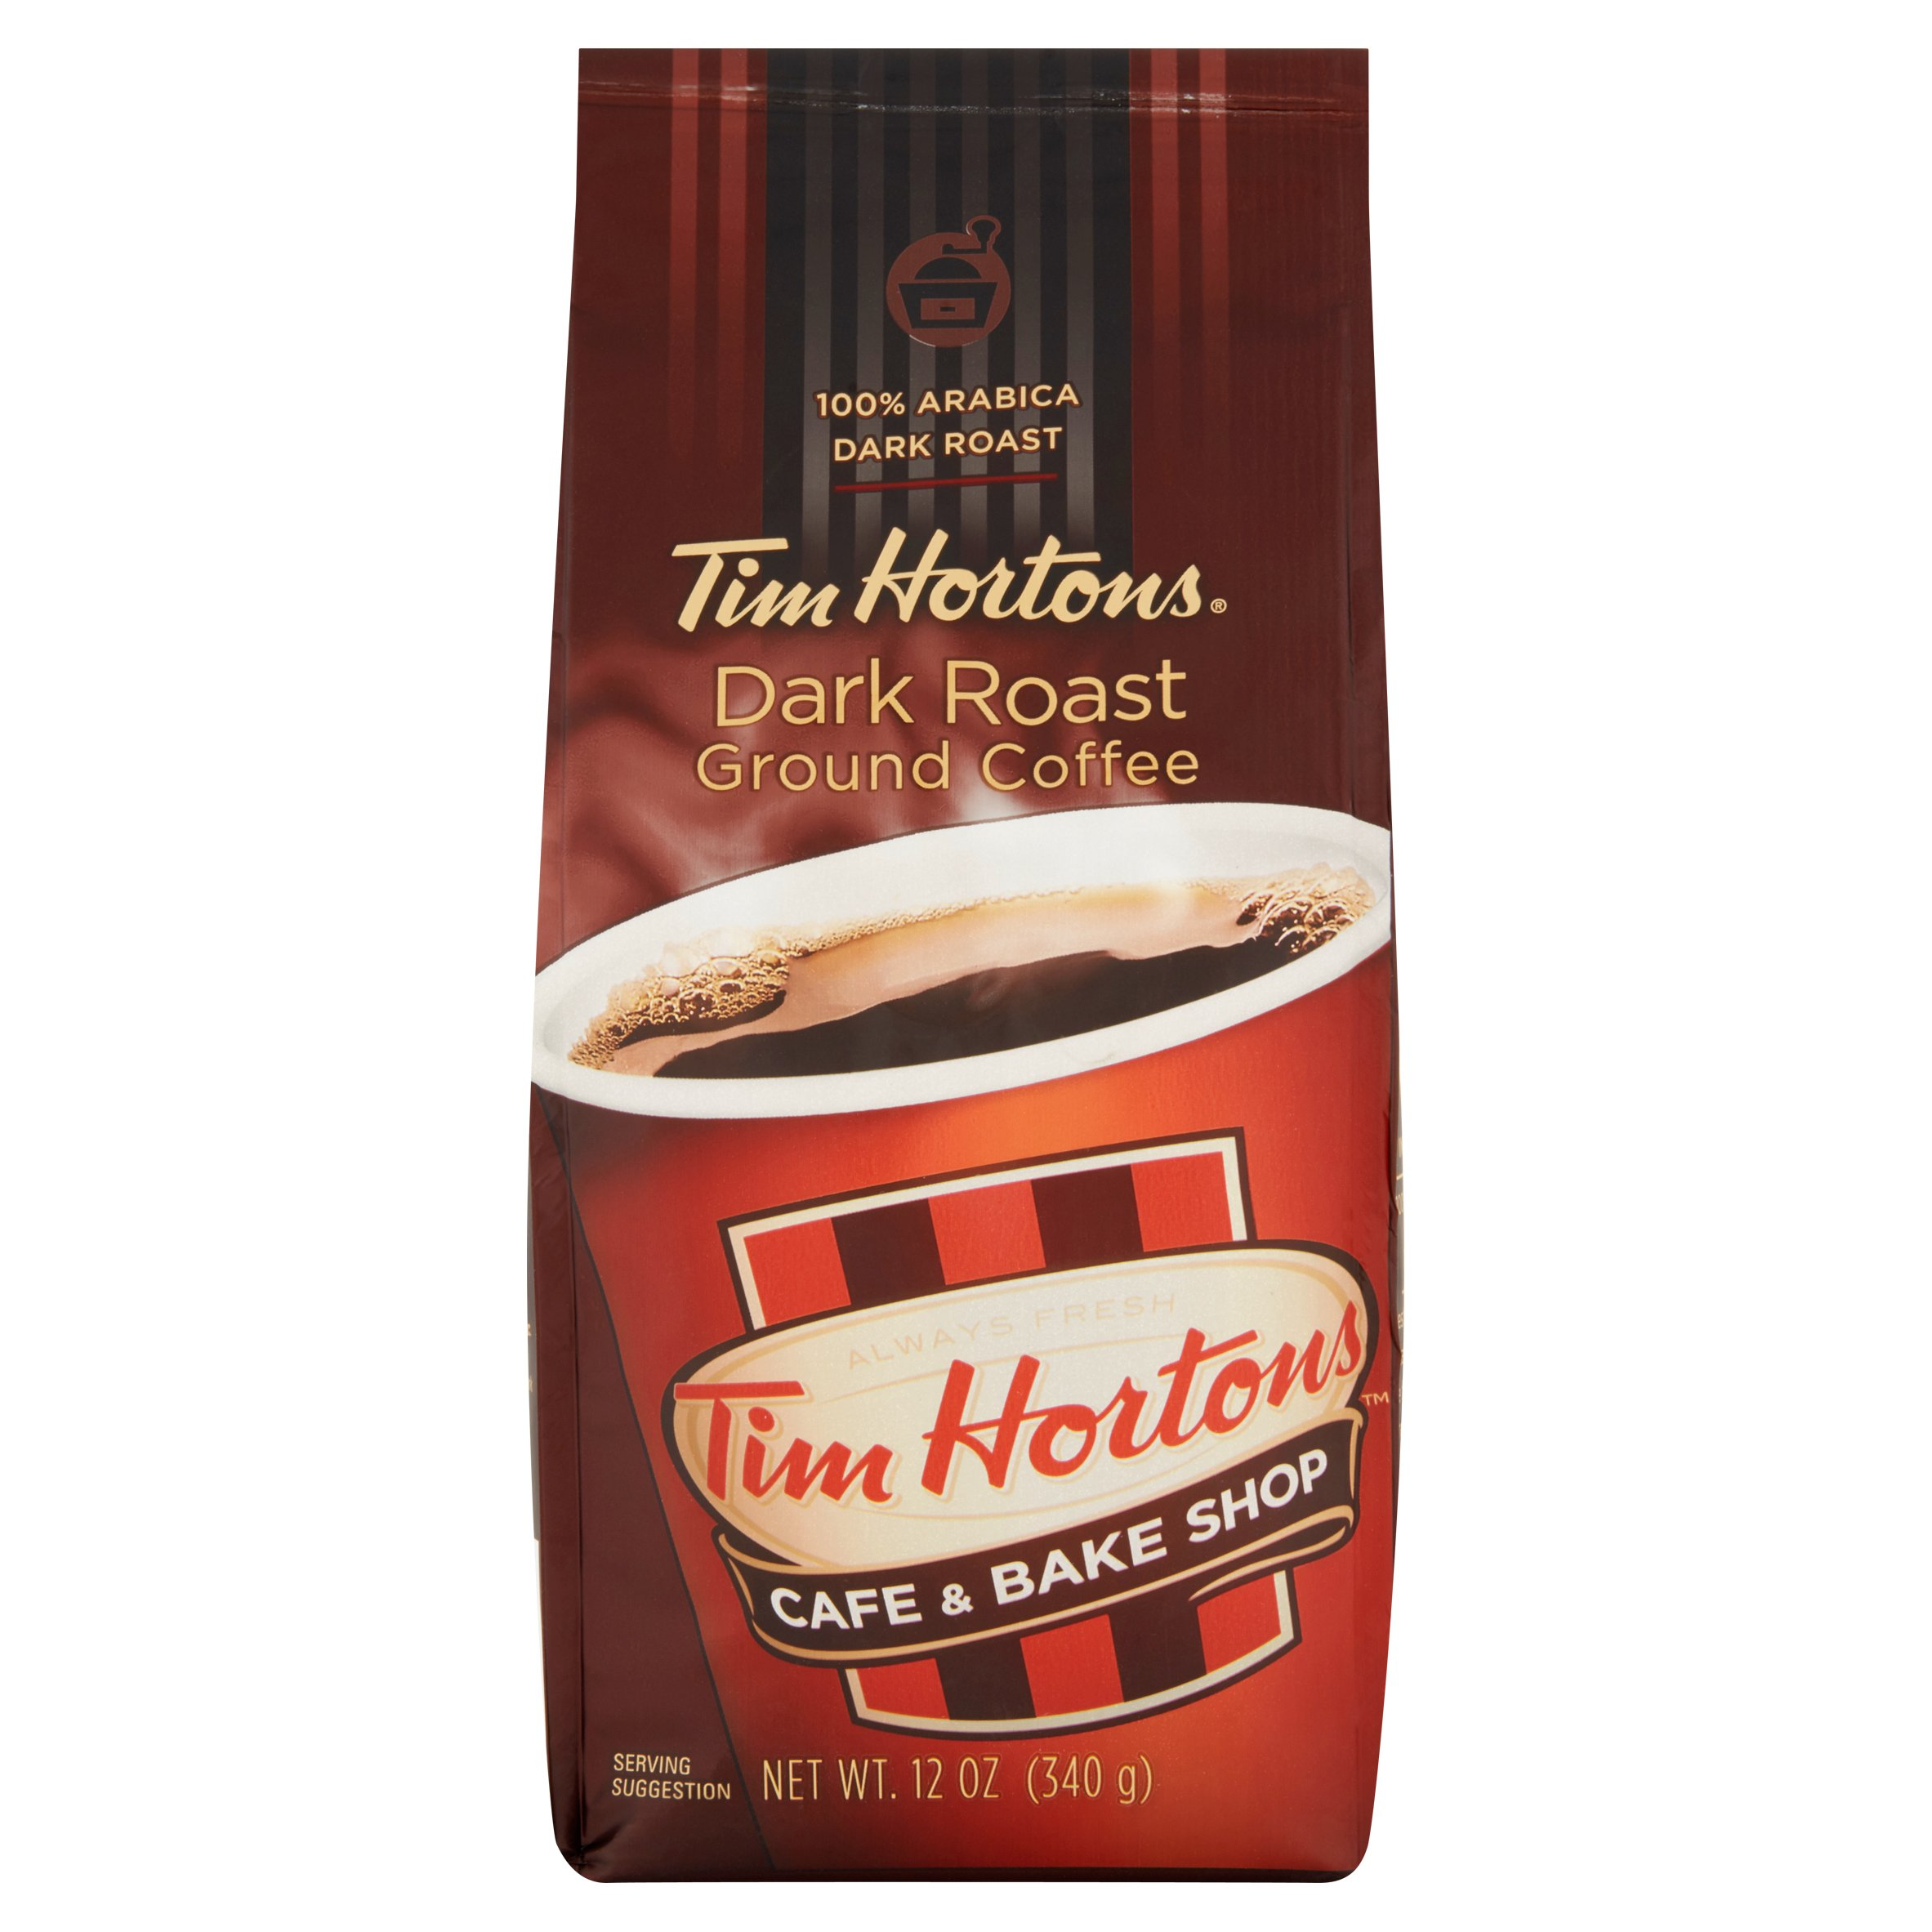 Tim Hortons Cafe & Bake Shop Dark Roast Ground Coffee, 12 oz, 6 pack